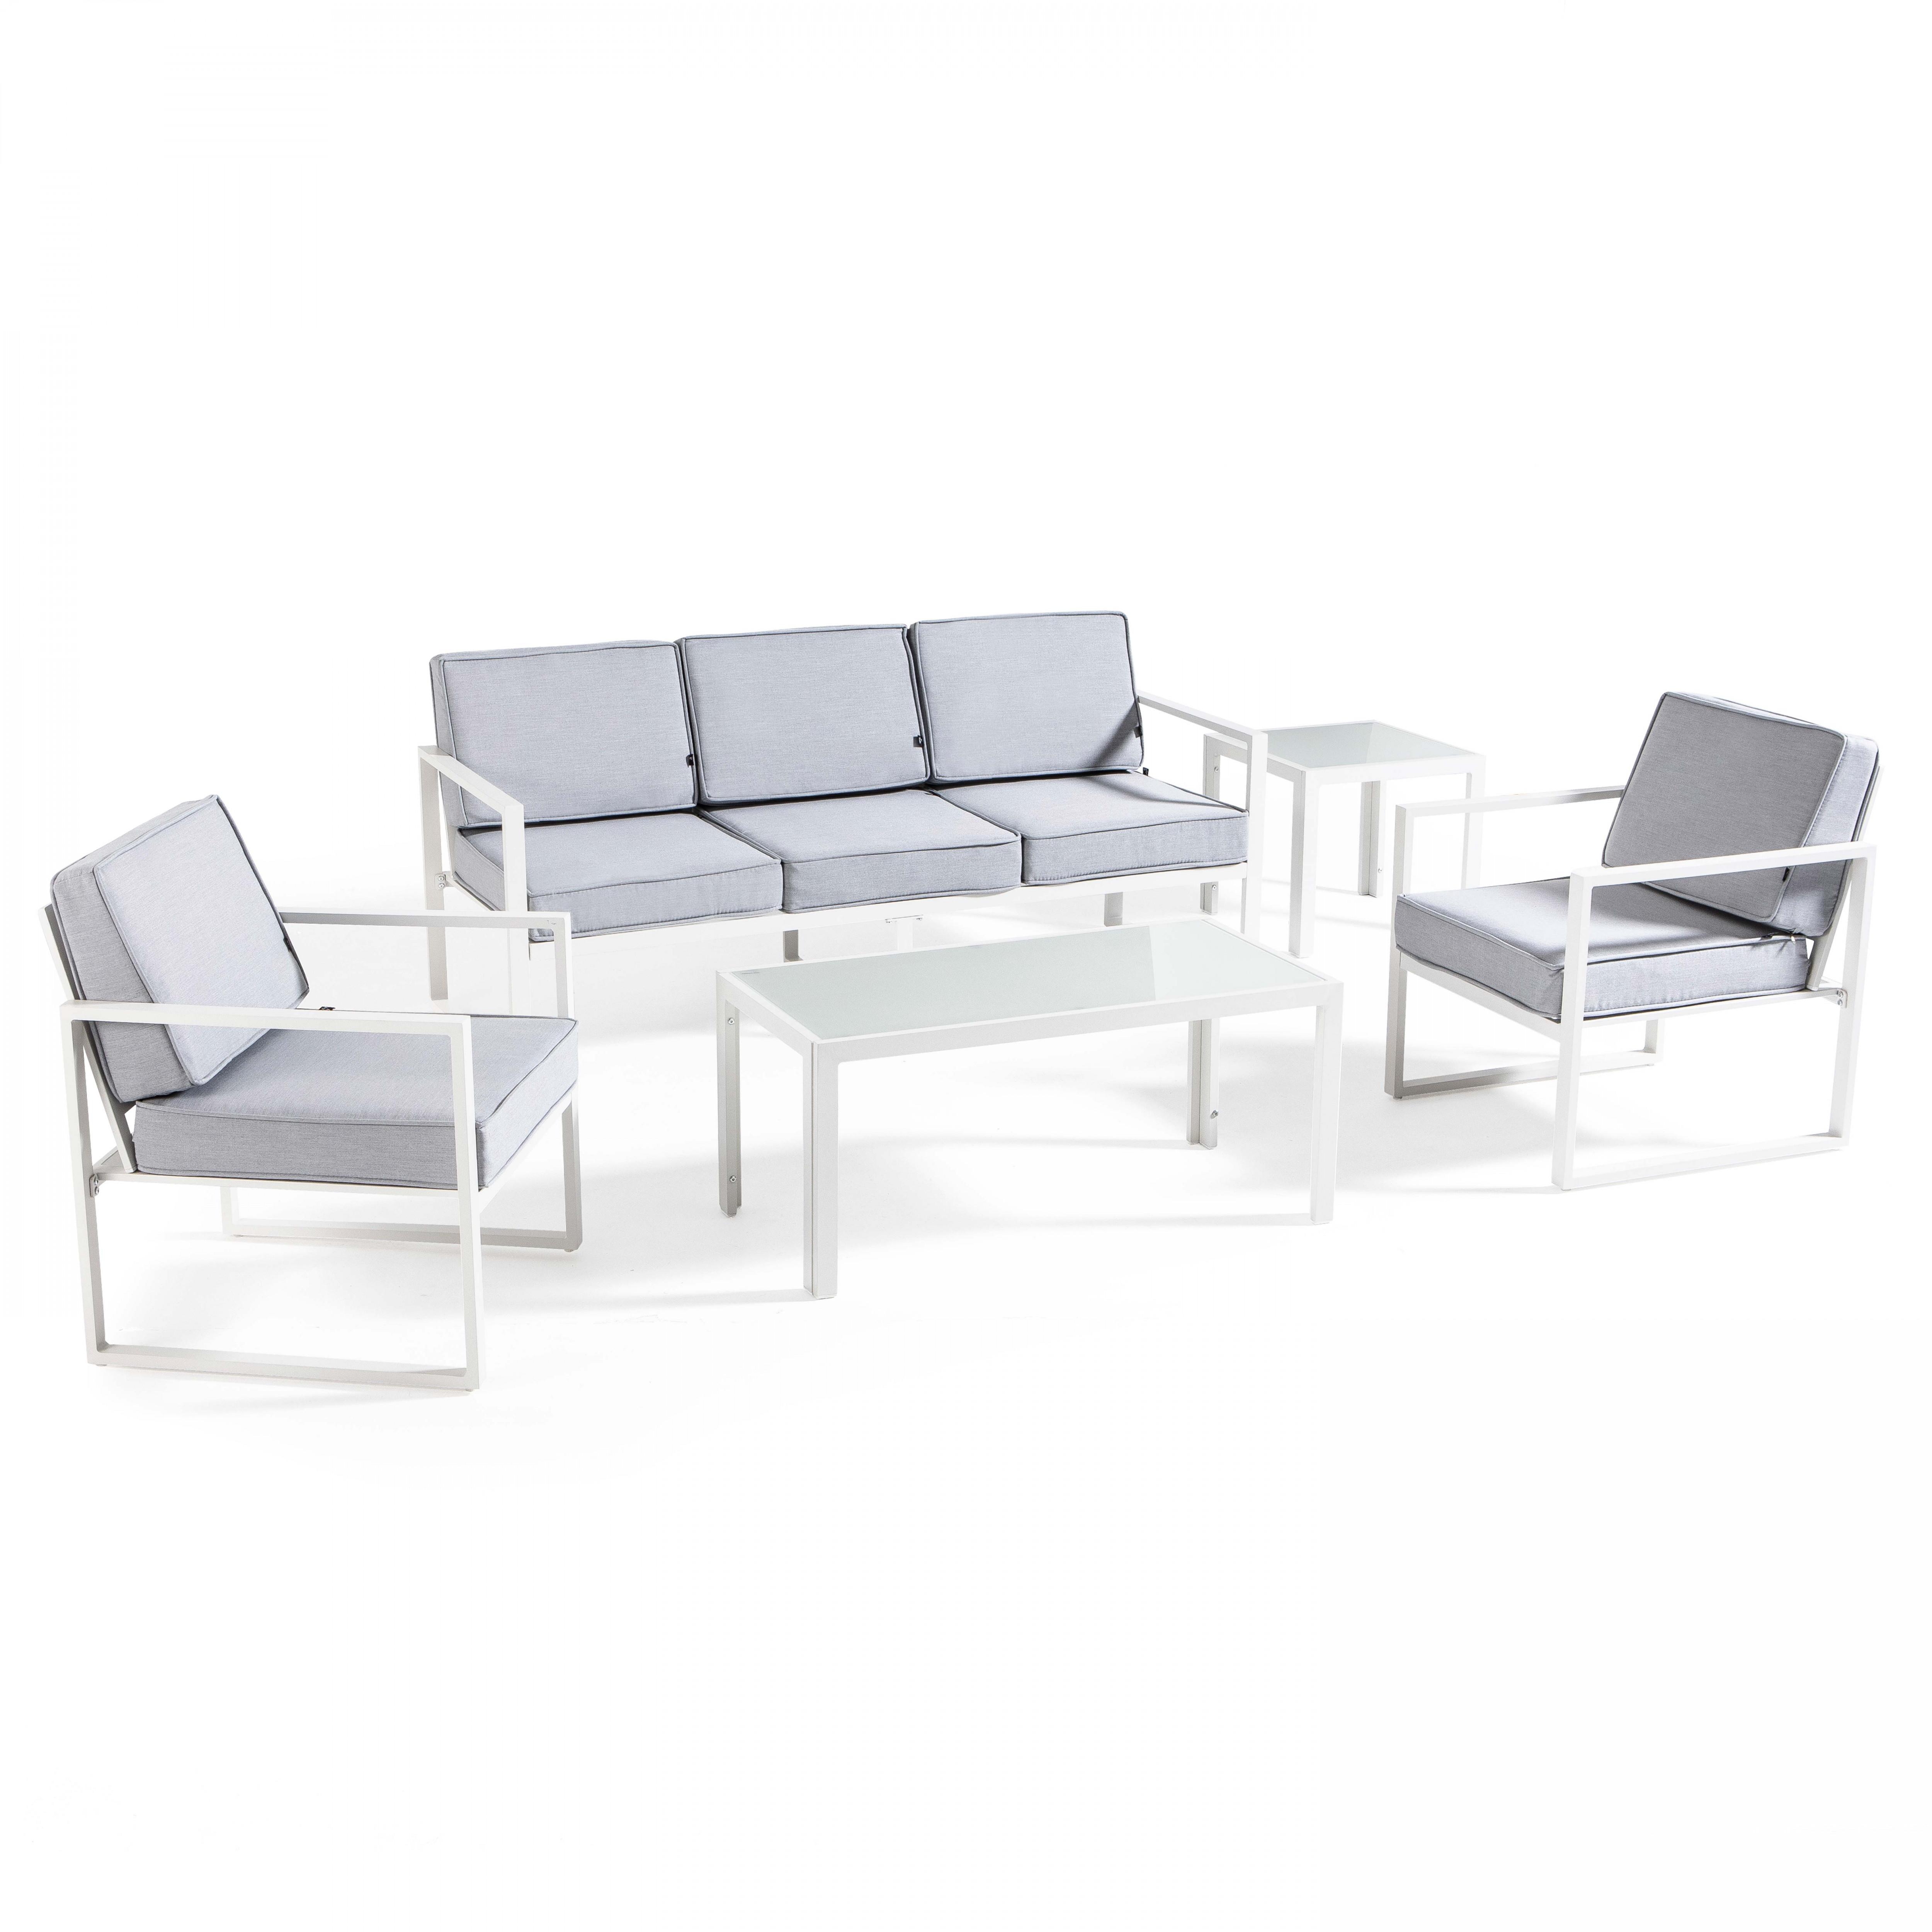 Salon de jardin 5 places en aluminium blanc